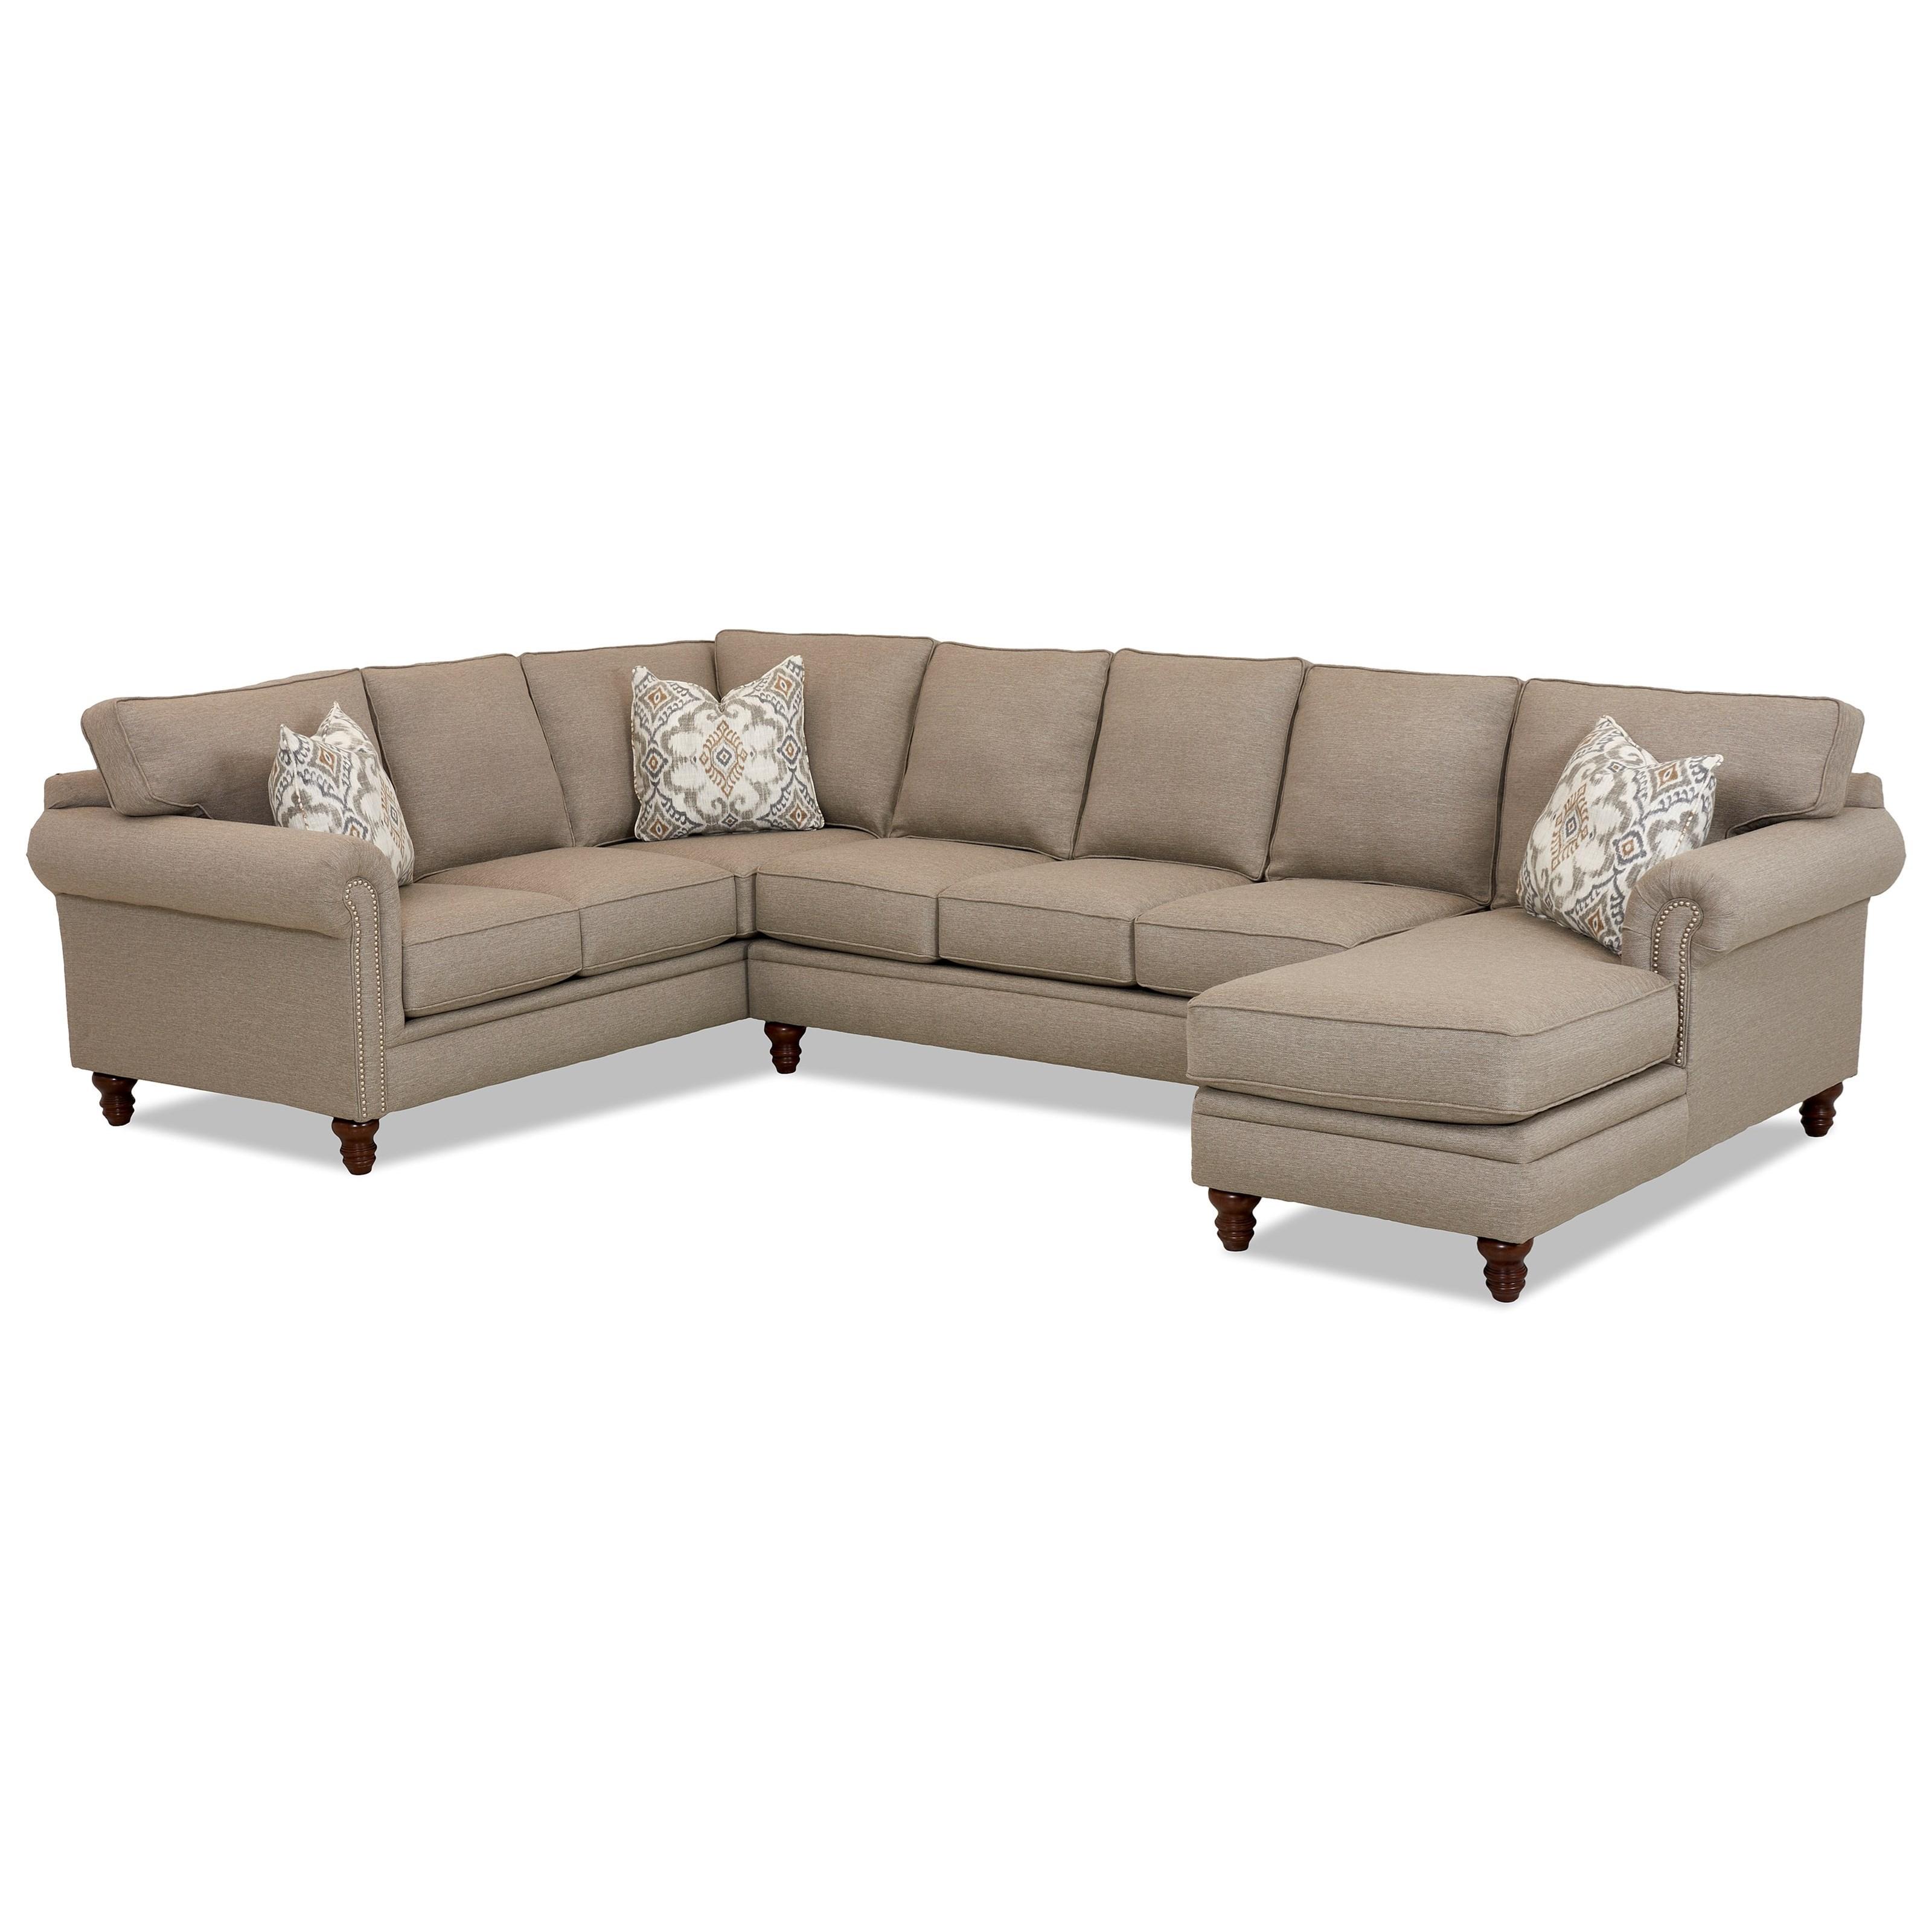 Klaussner Carter3 Pc Sectional Sofa ...